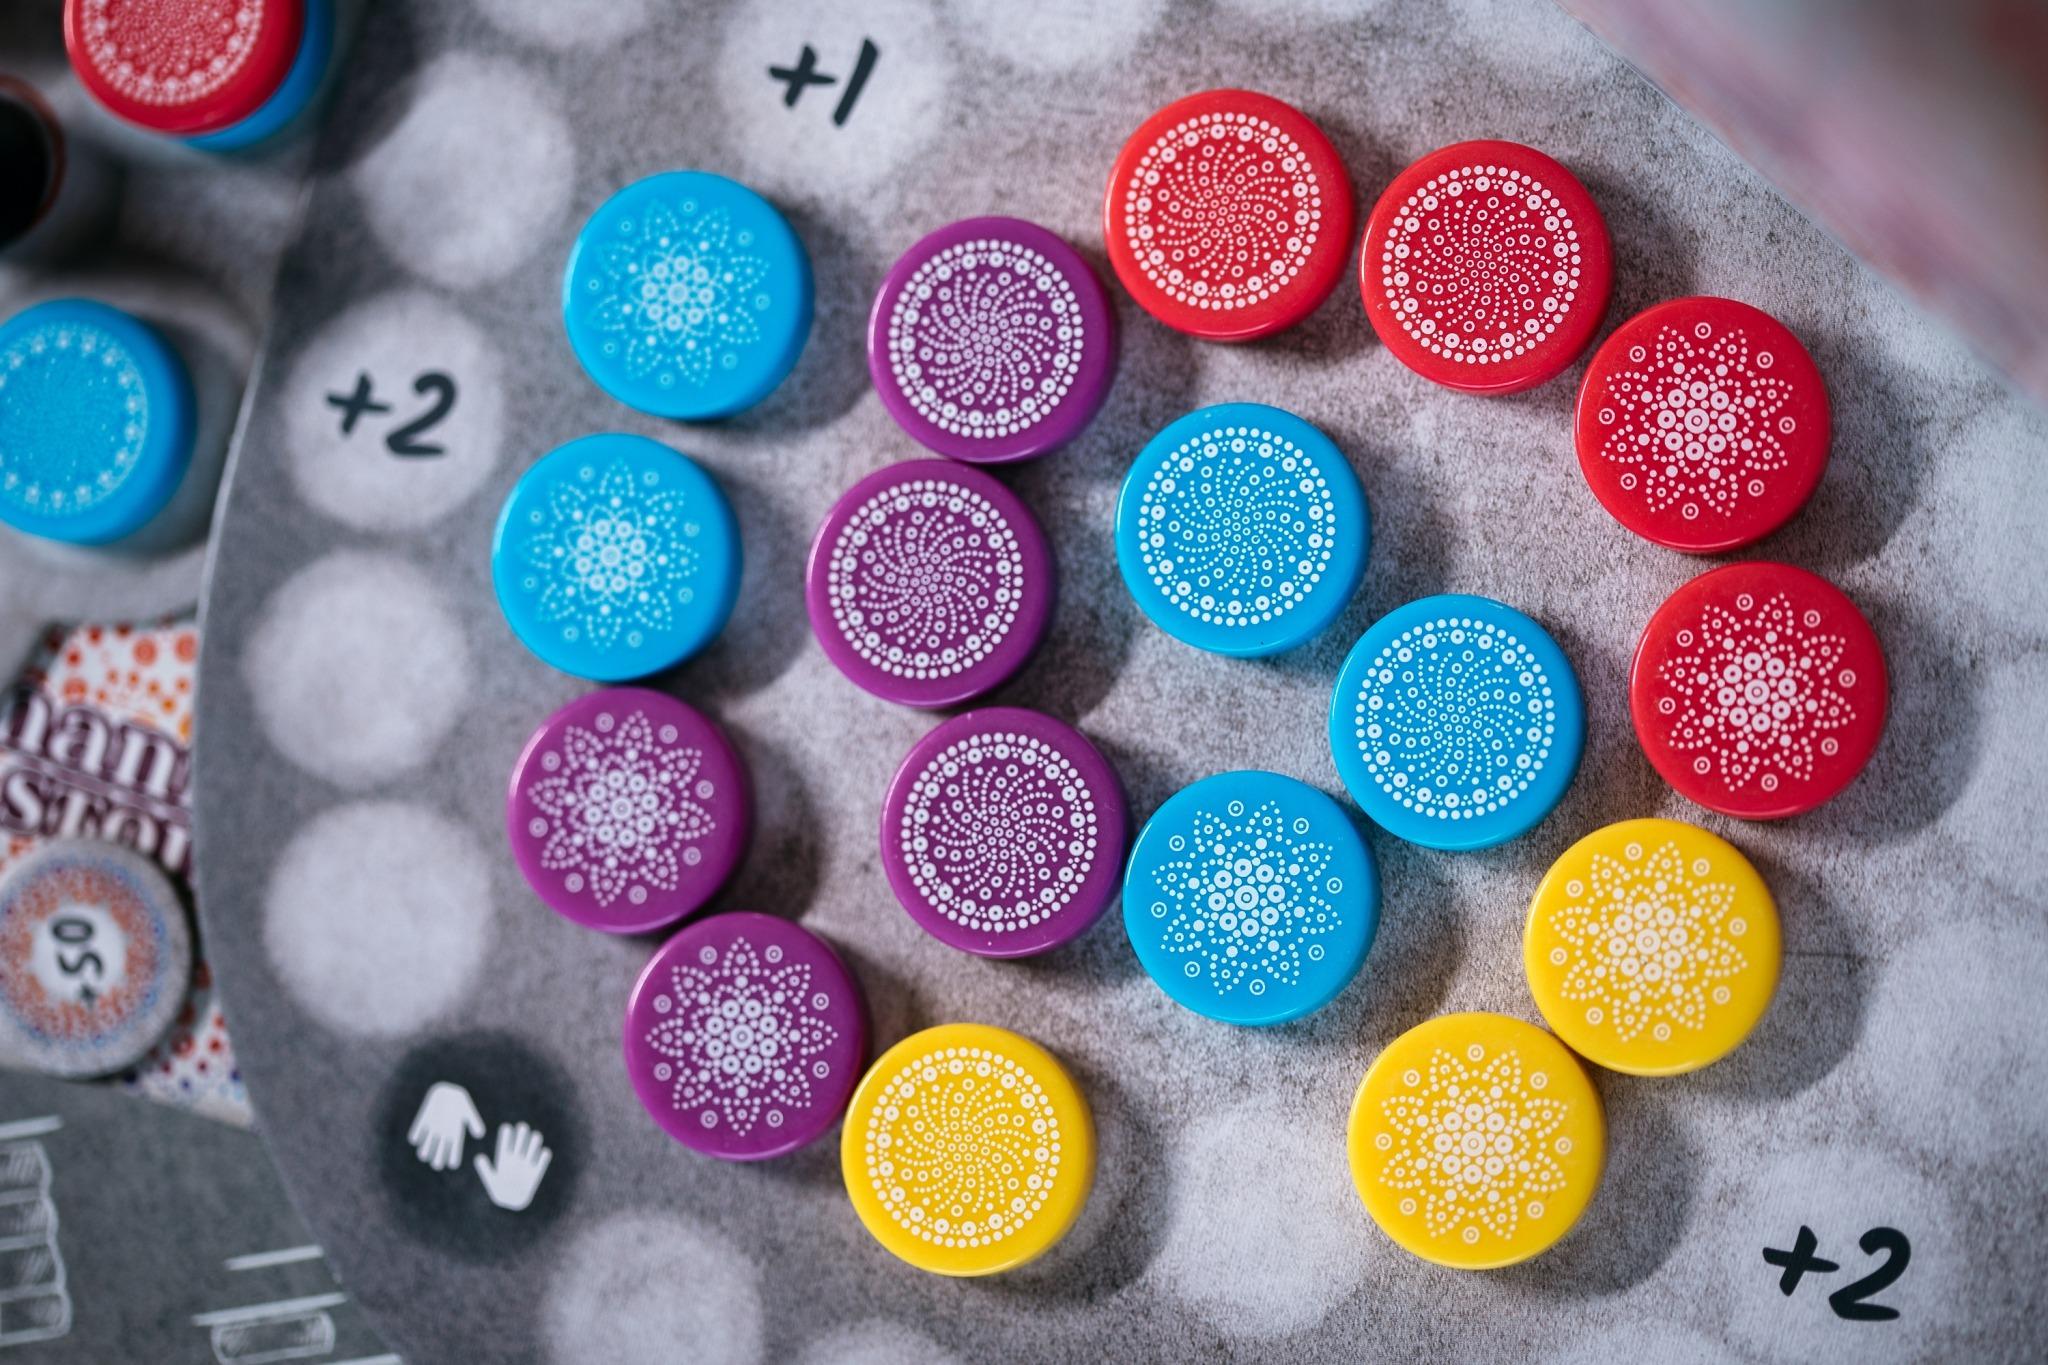 mandala stones luckyduckgames jeu de société boardgame